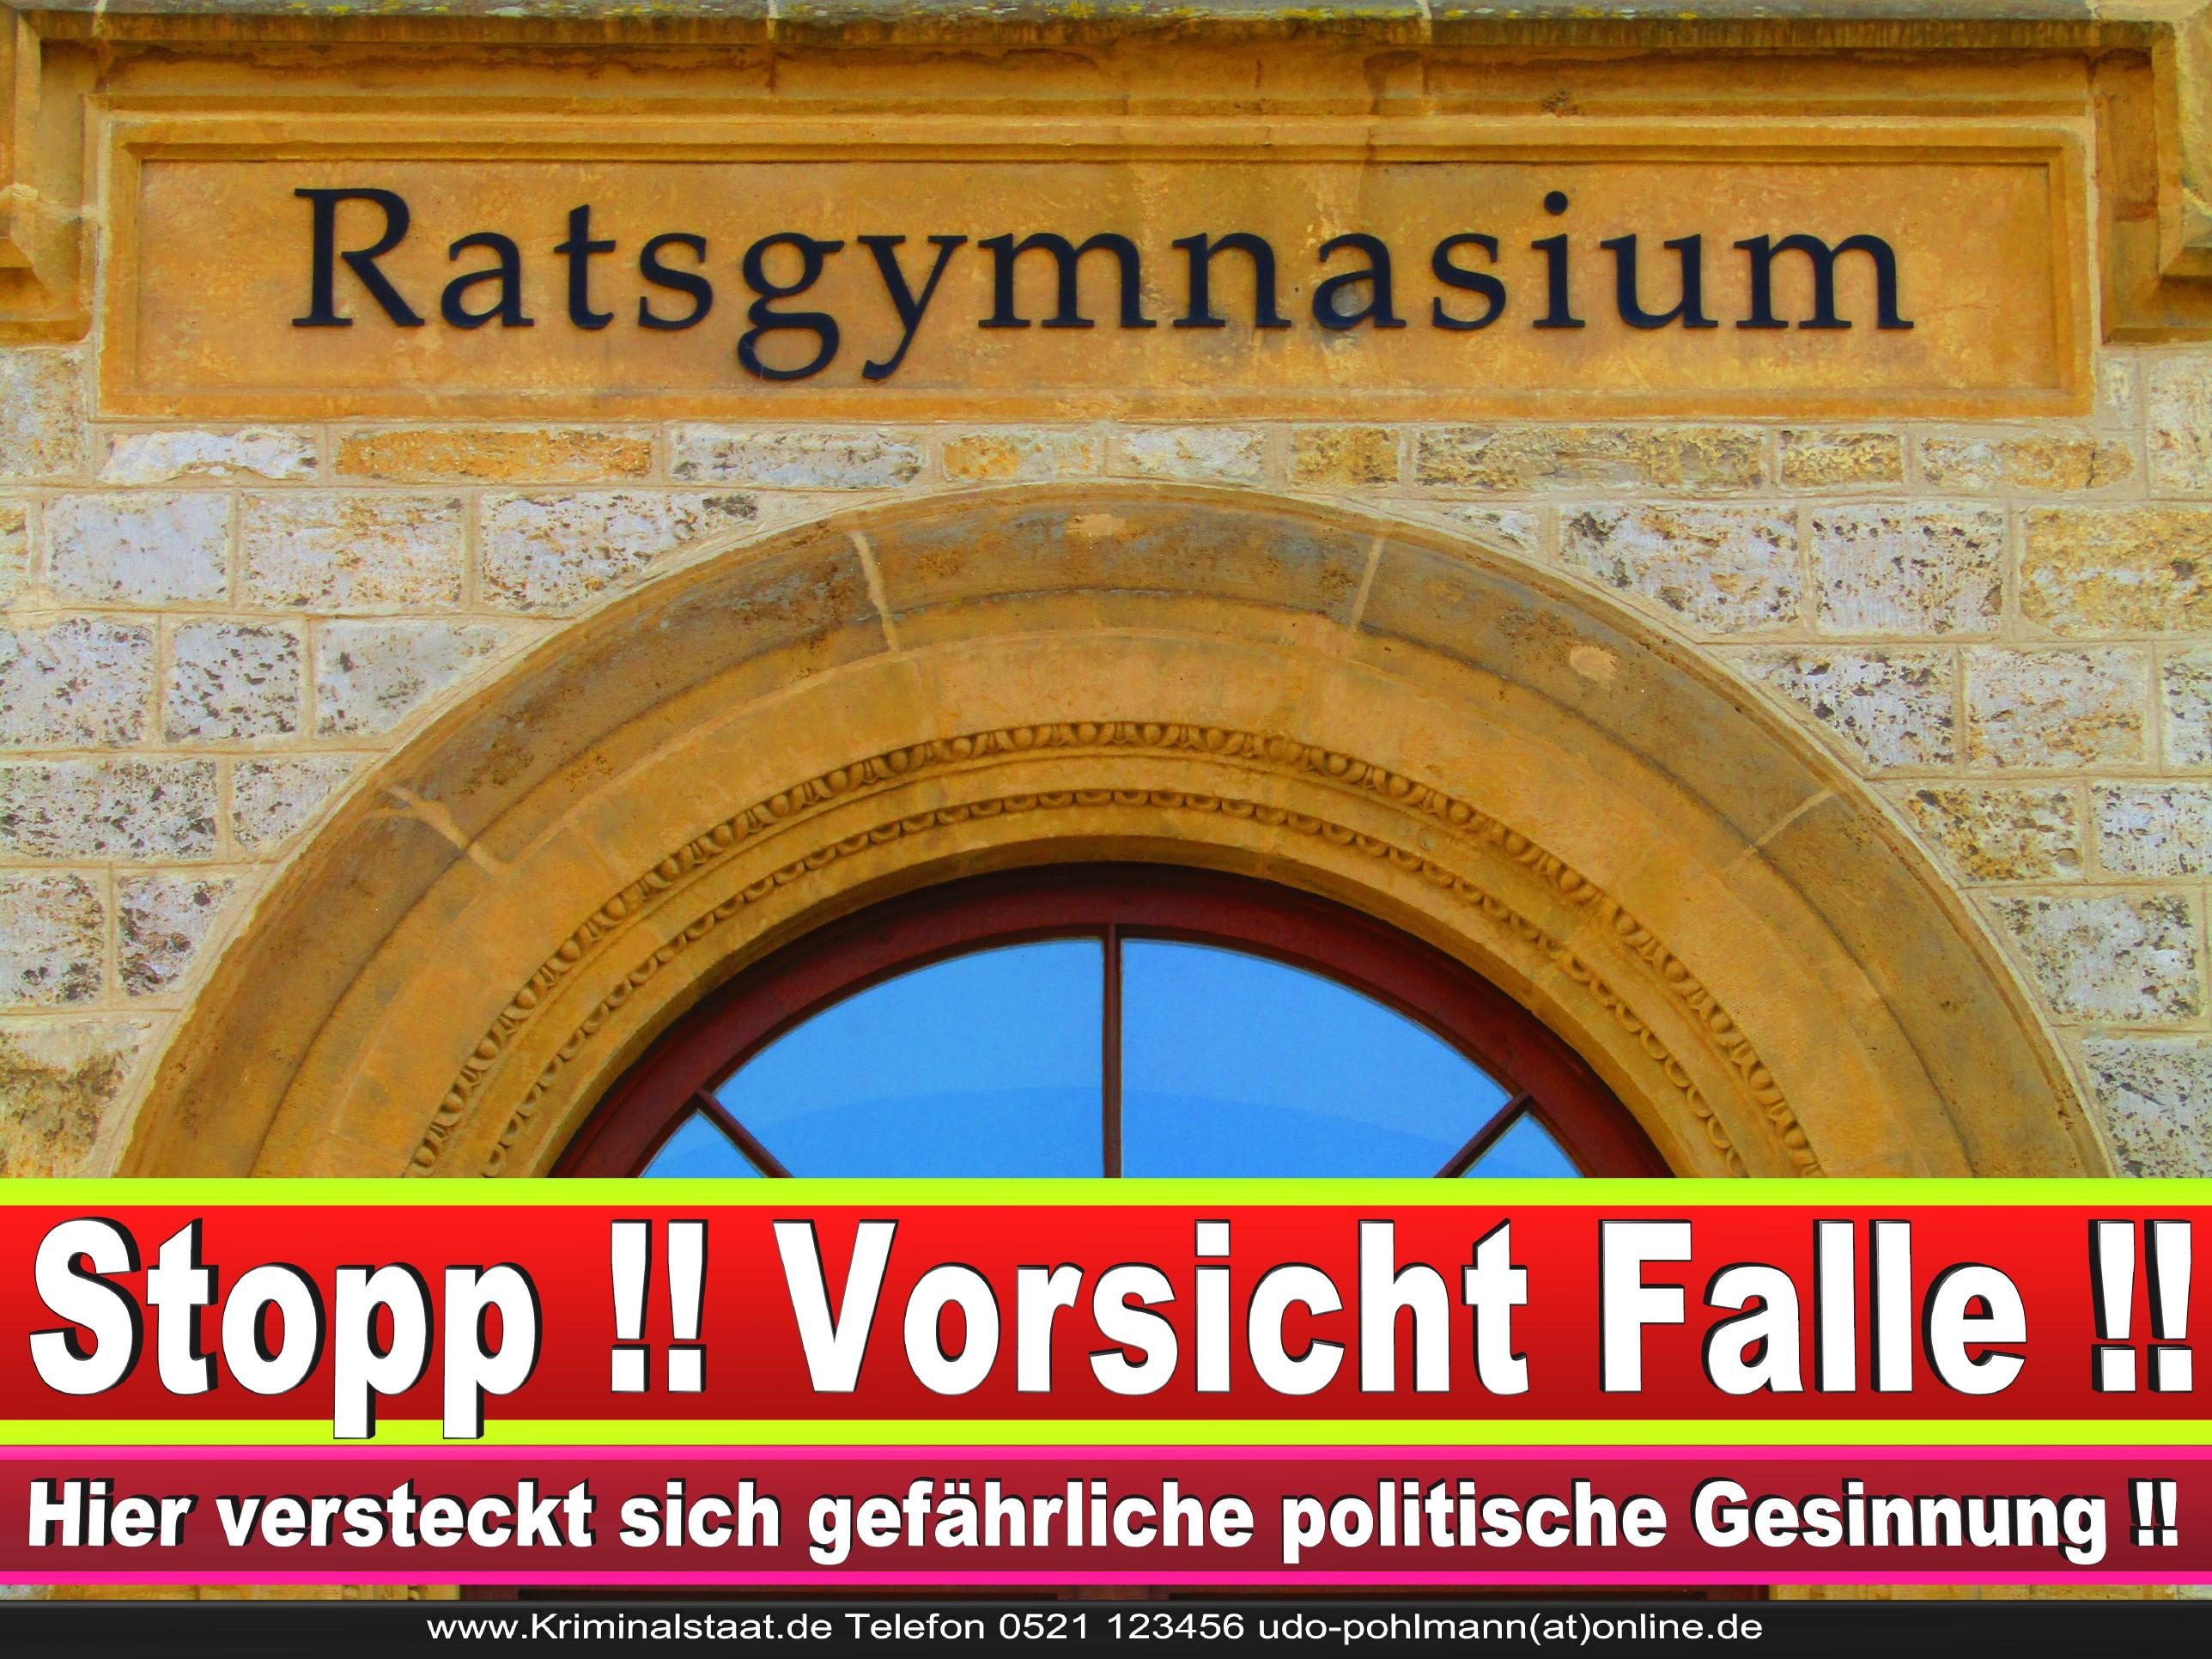 RATSGYMNASIUM BIELEFELD NORMAN GRAESER CDU BIELEFELD 2 LANDTAGSWAHL BUNDESTAGSWAHL BÜRGERMEISTERWAHL